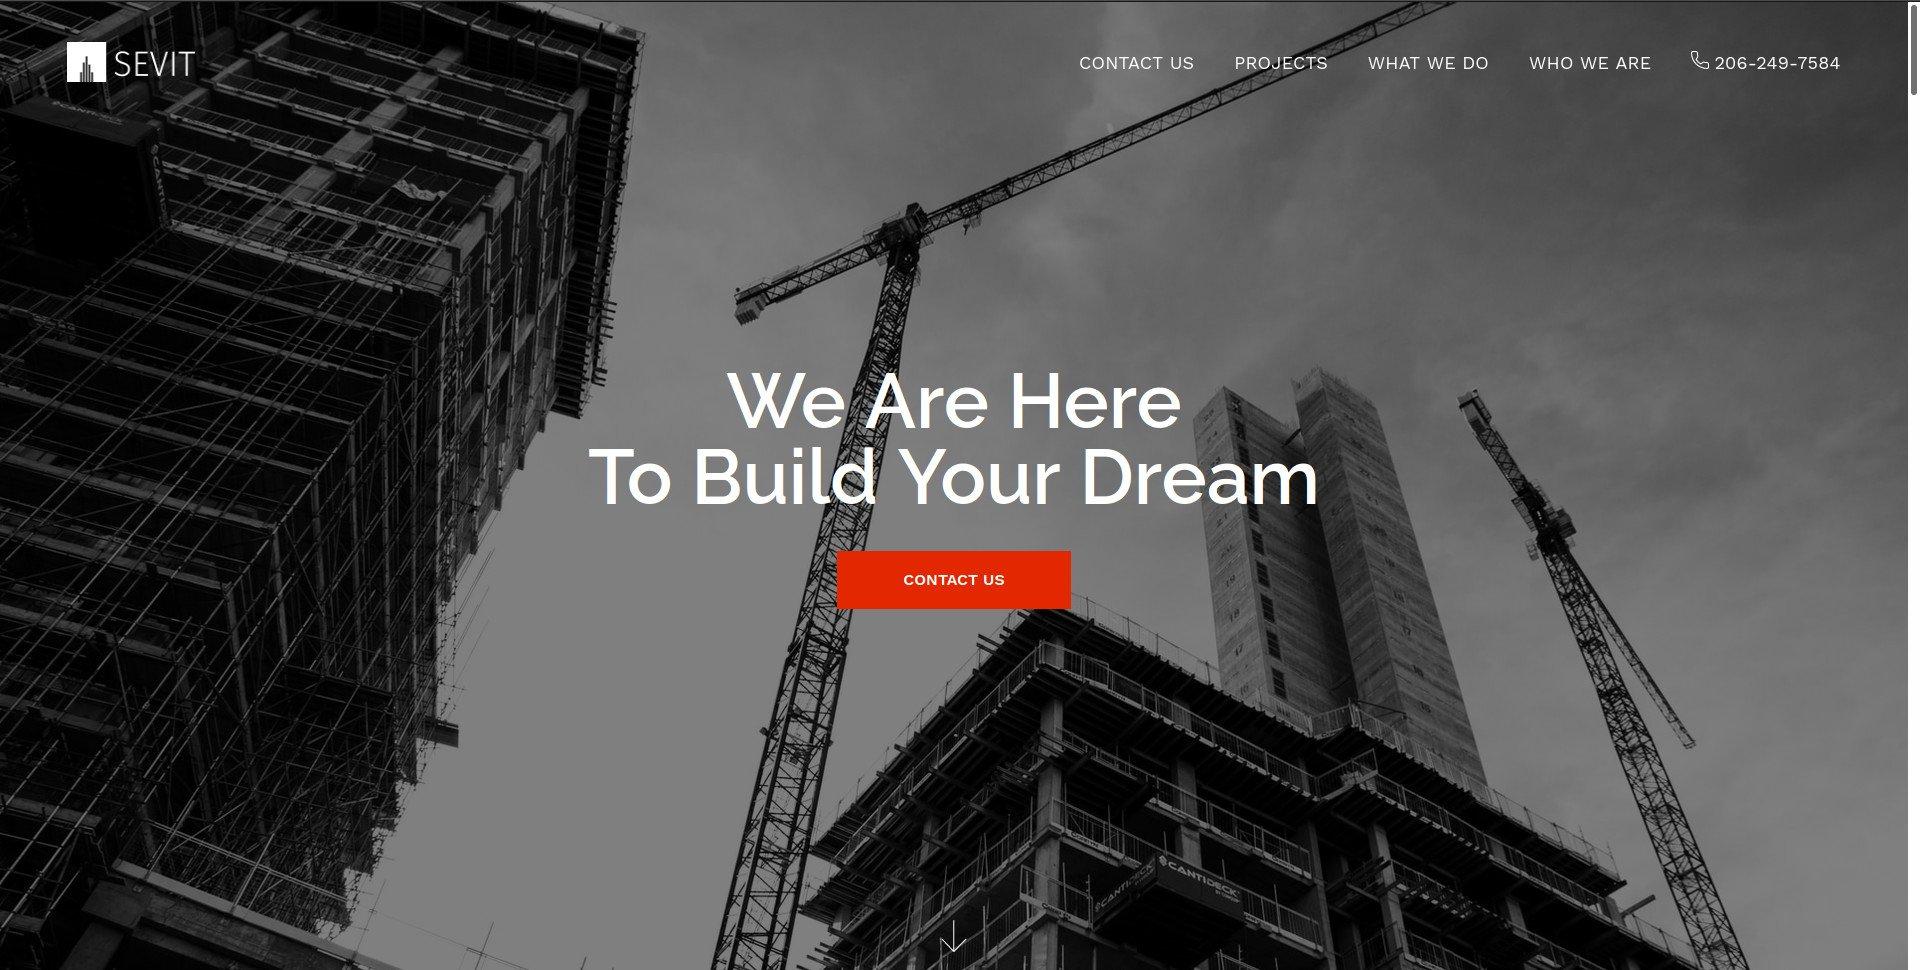 Sevit Project